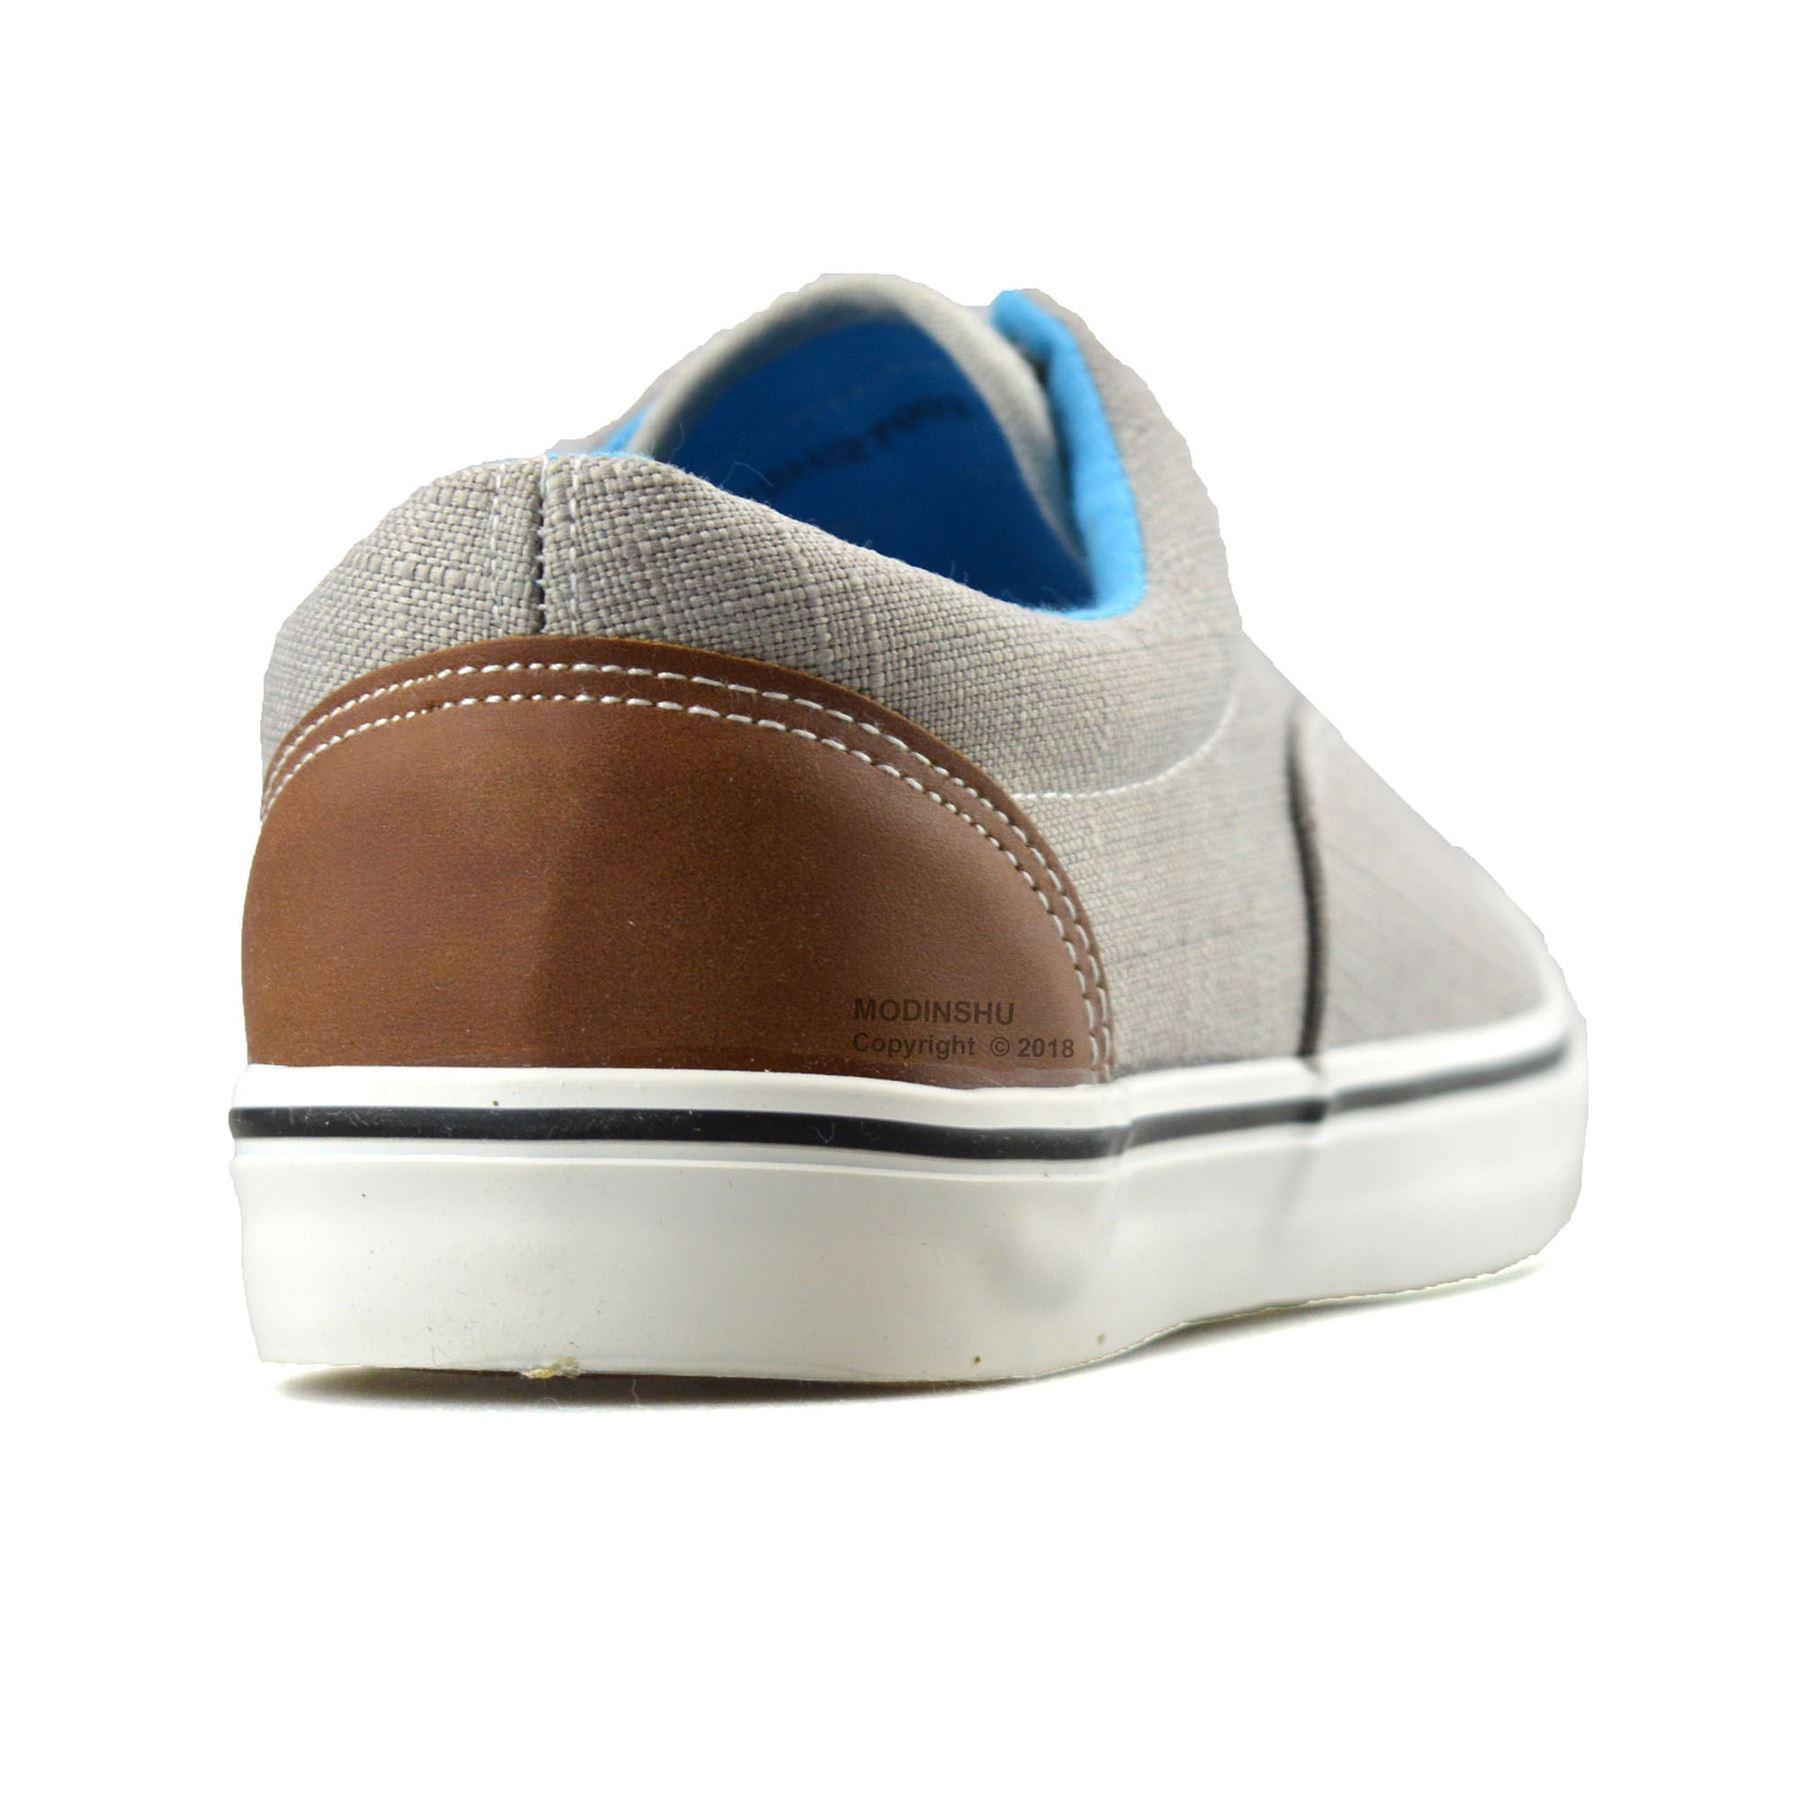 Mens-Casual-Flat-Lace-Up-Canvas-Skate-Pumps-Walking-Plimsolls-Trainers-Shoe-Size thumbnail 19